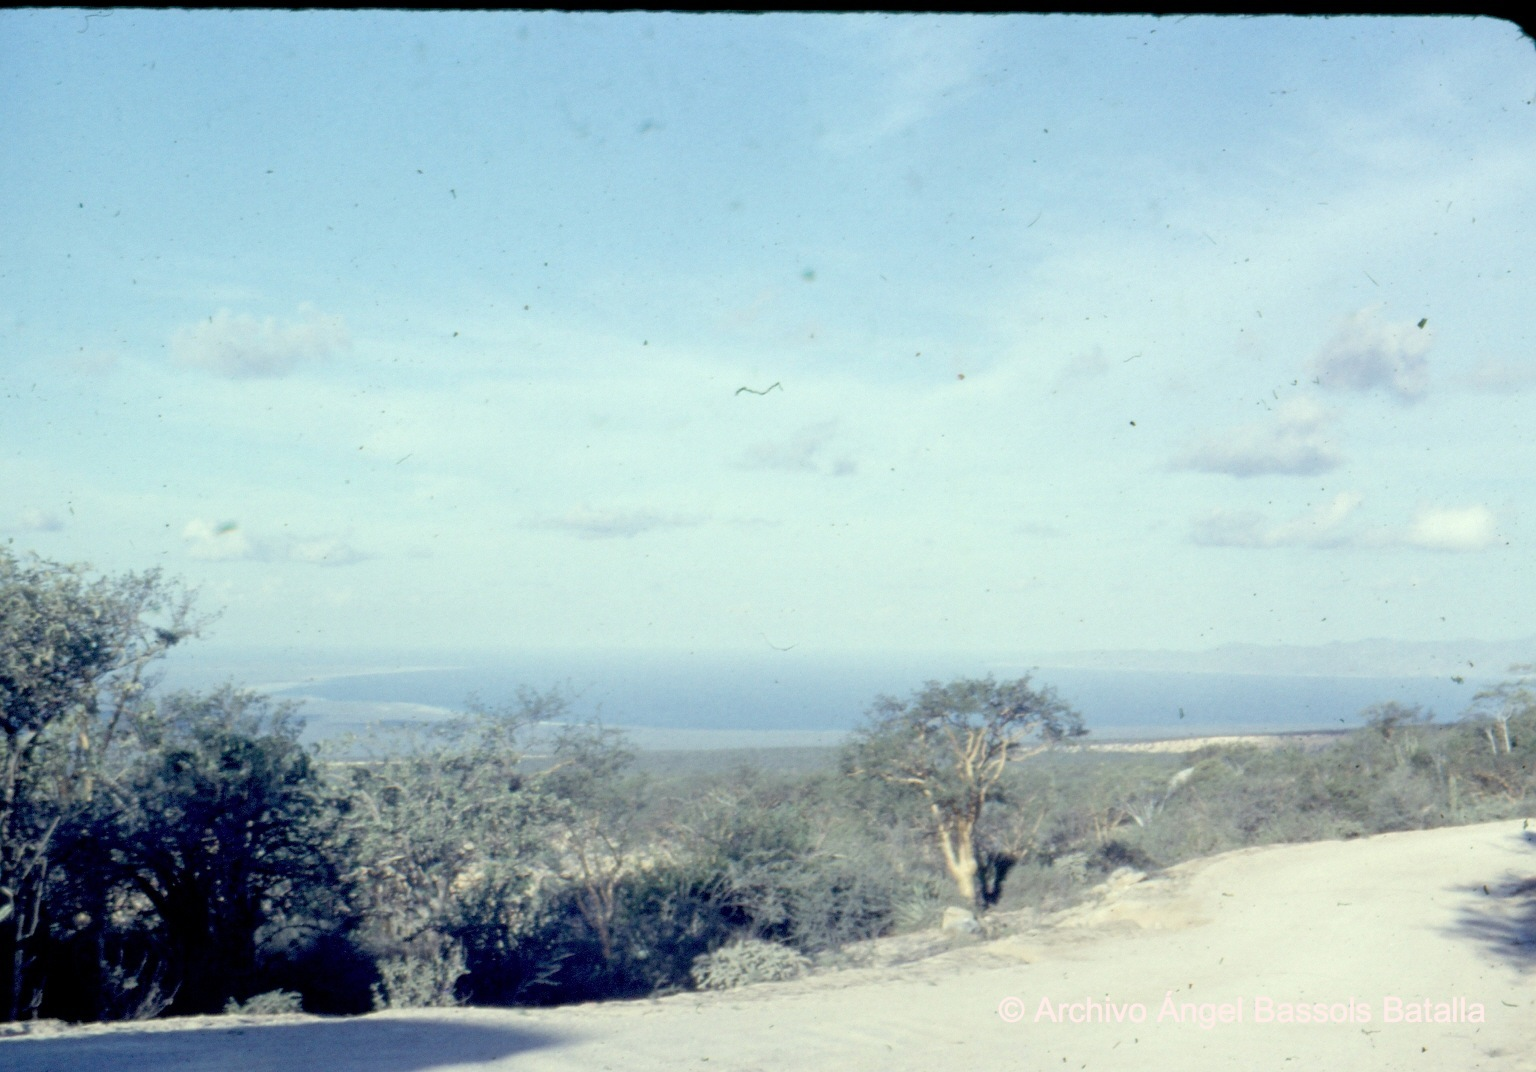 Montañas Cacachilas